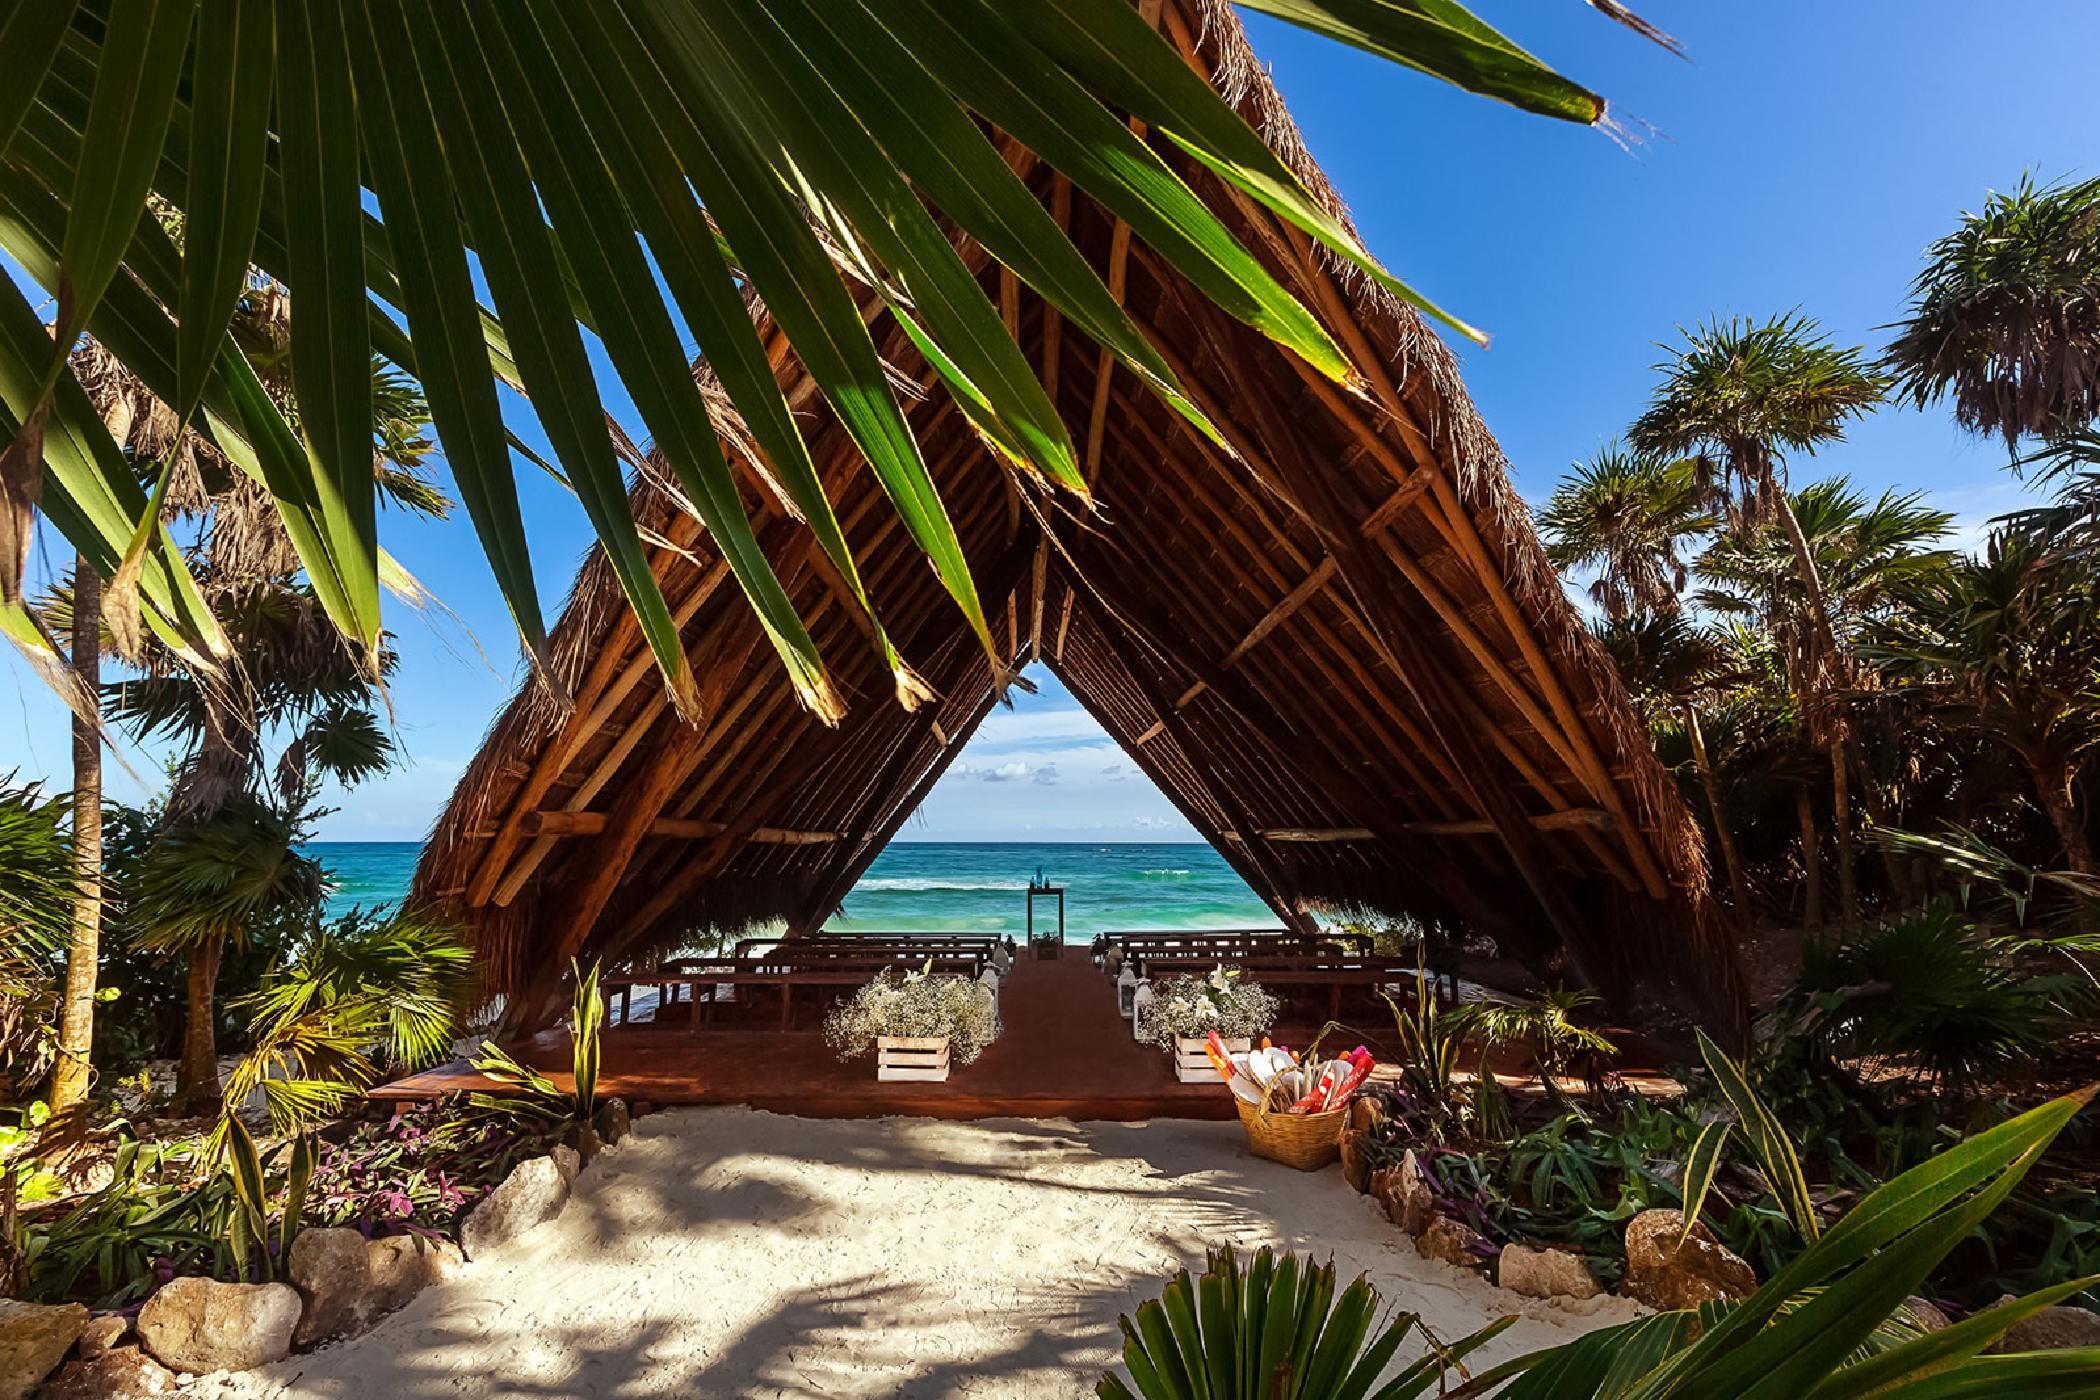 Maya_Luxe_Riviera_Maya_Luxury_Villas_Experiences_Hotel_Zone_Tulum_Beach_5_Bedrooms_Casa_Palapa_21.jpg